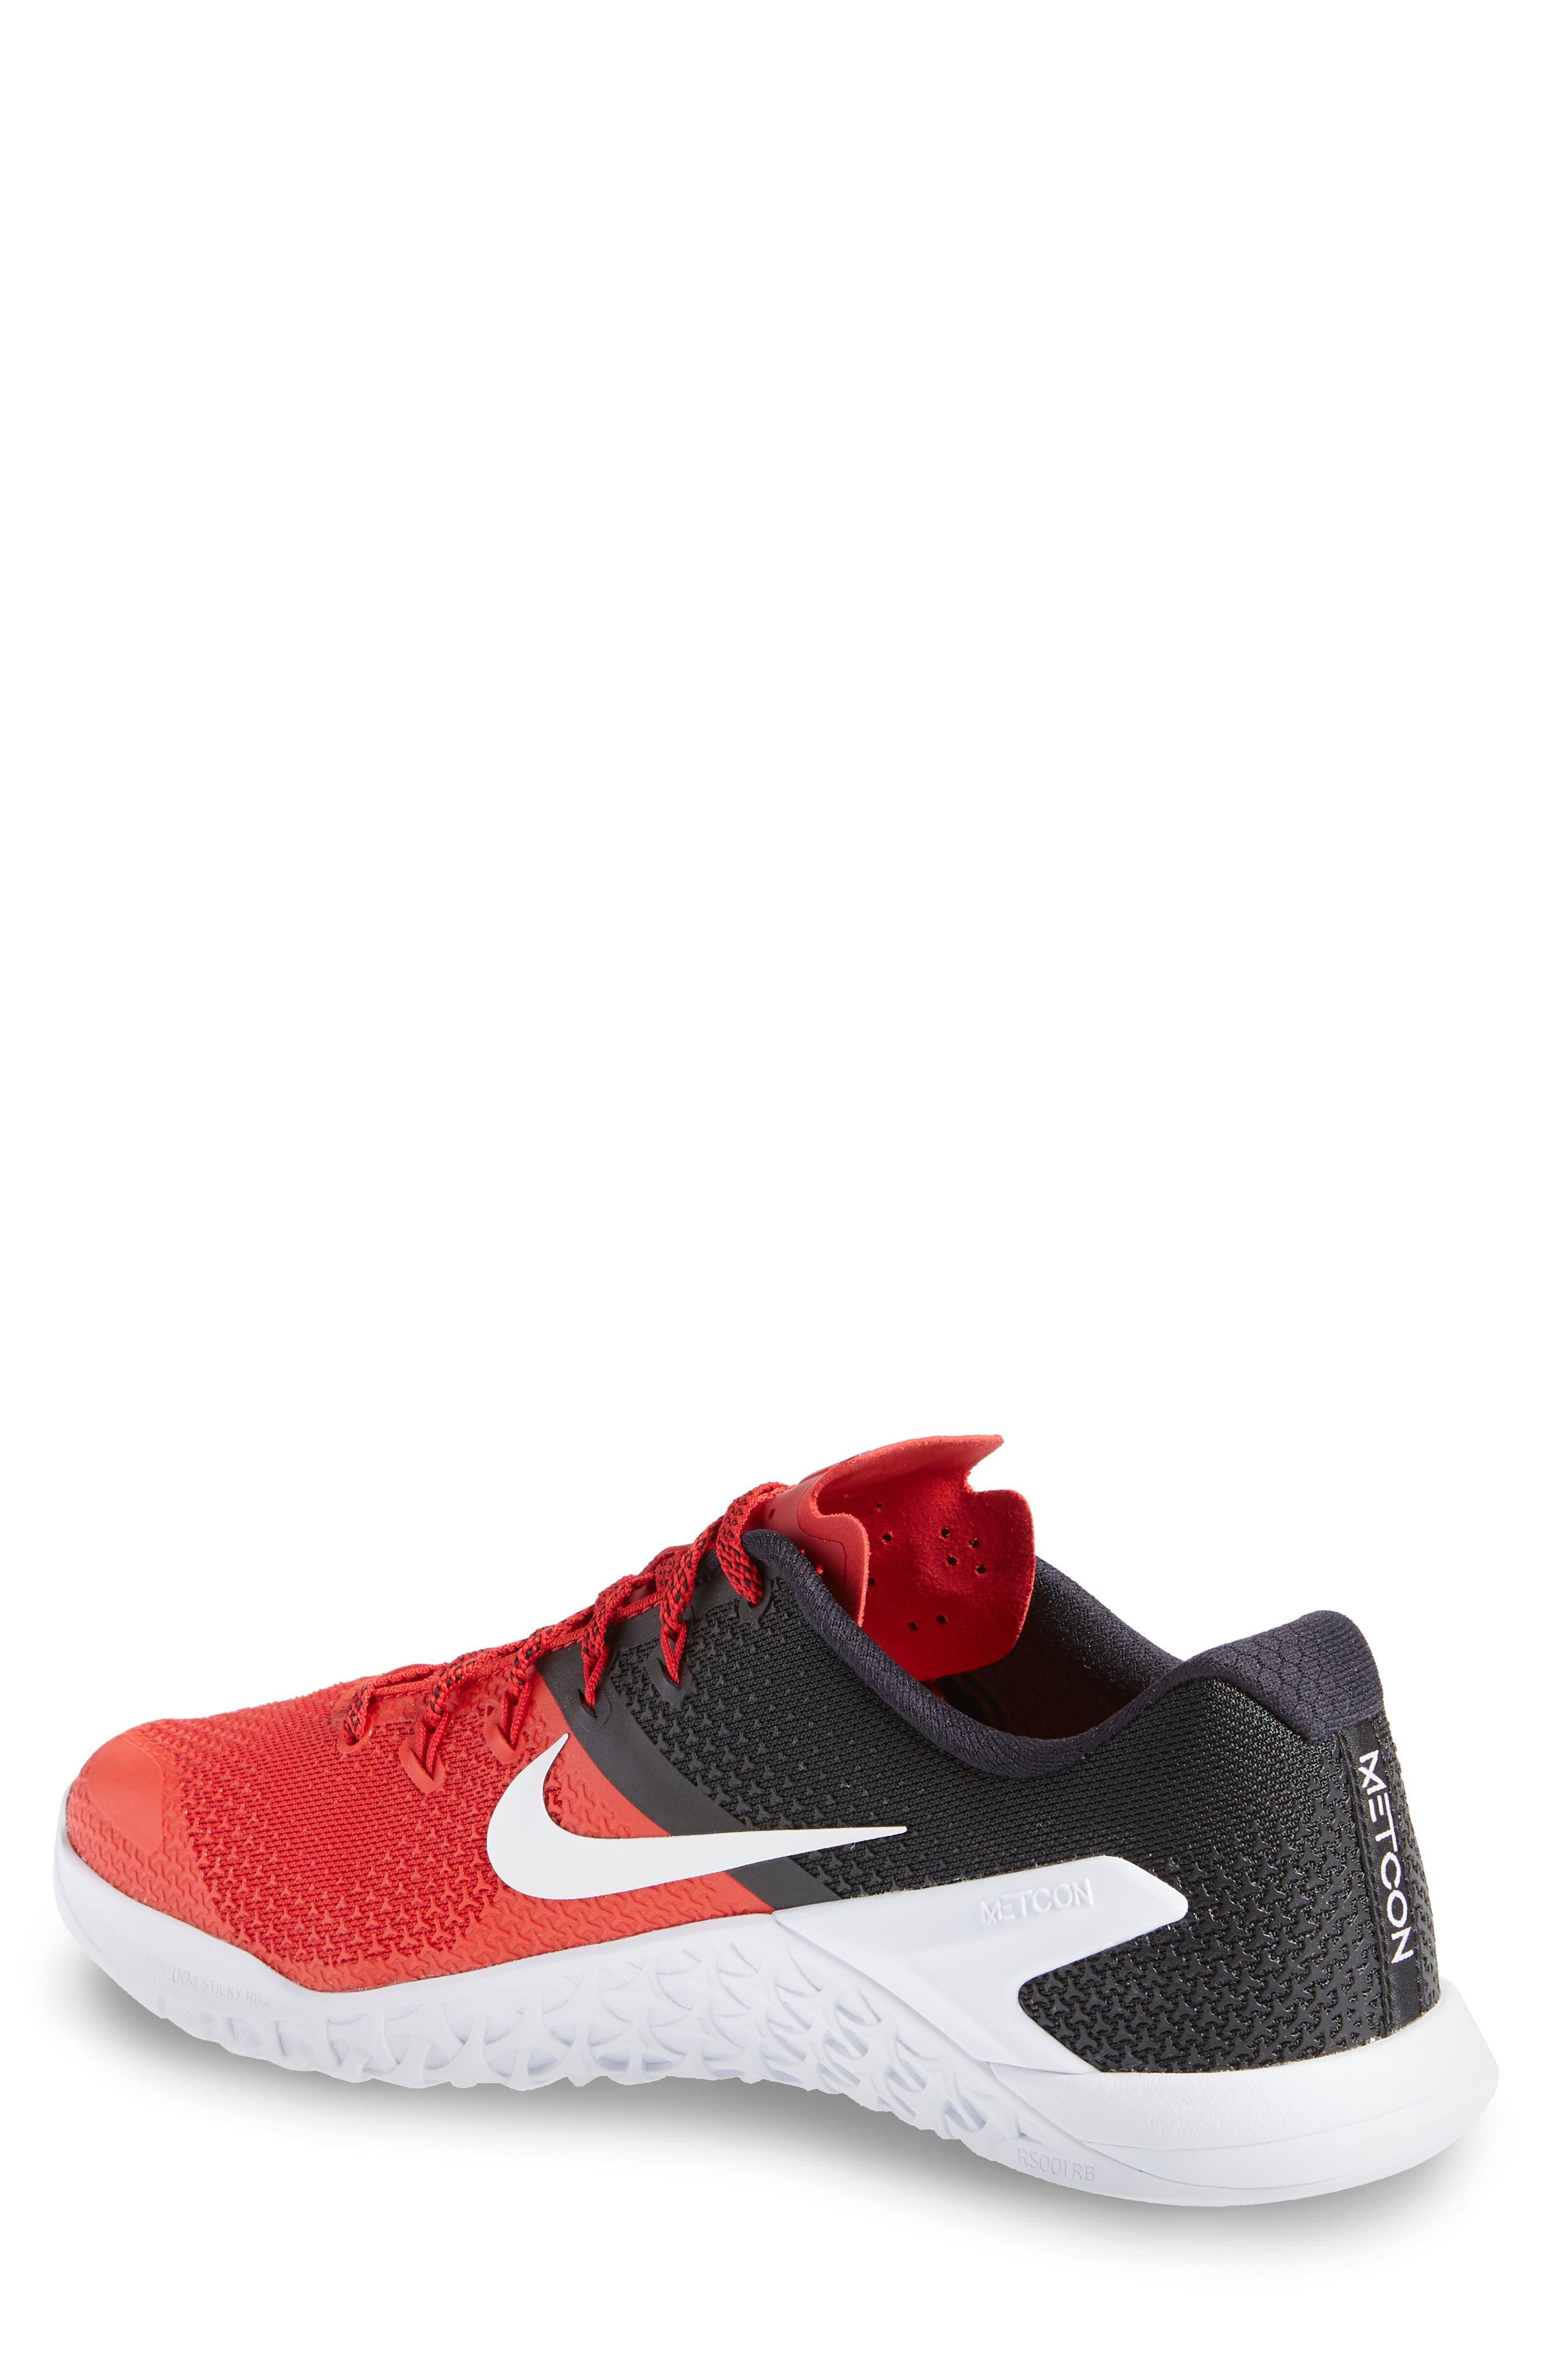 Metcon 4 Training Shoe,                             Alternate thumbnail 34, color,